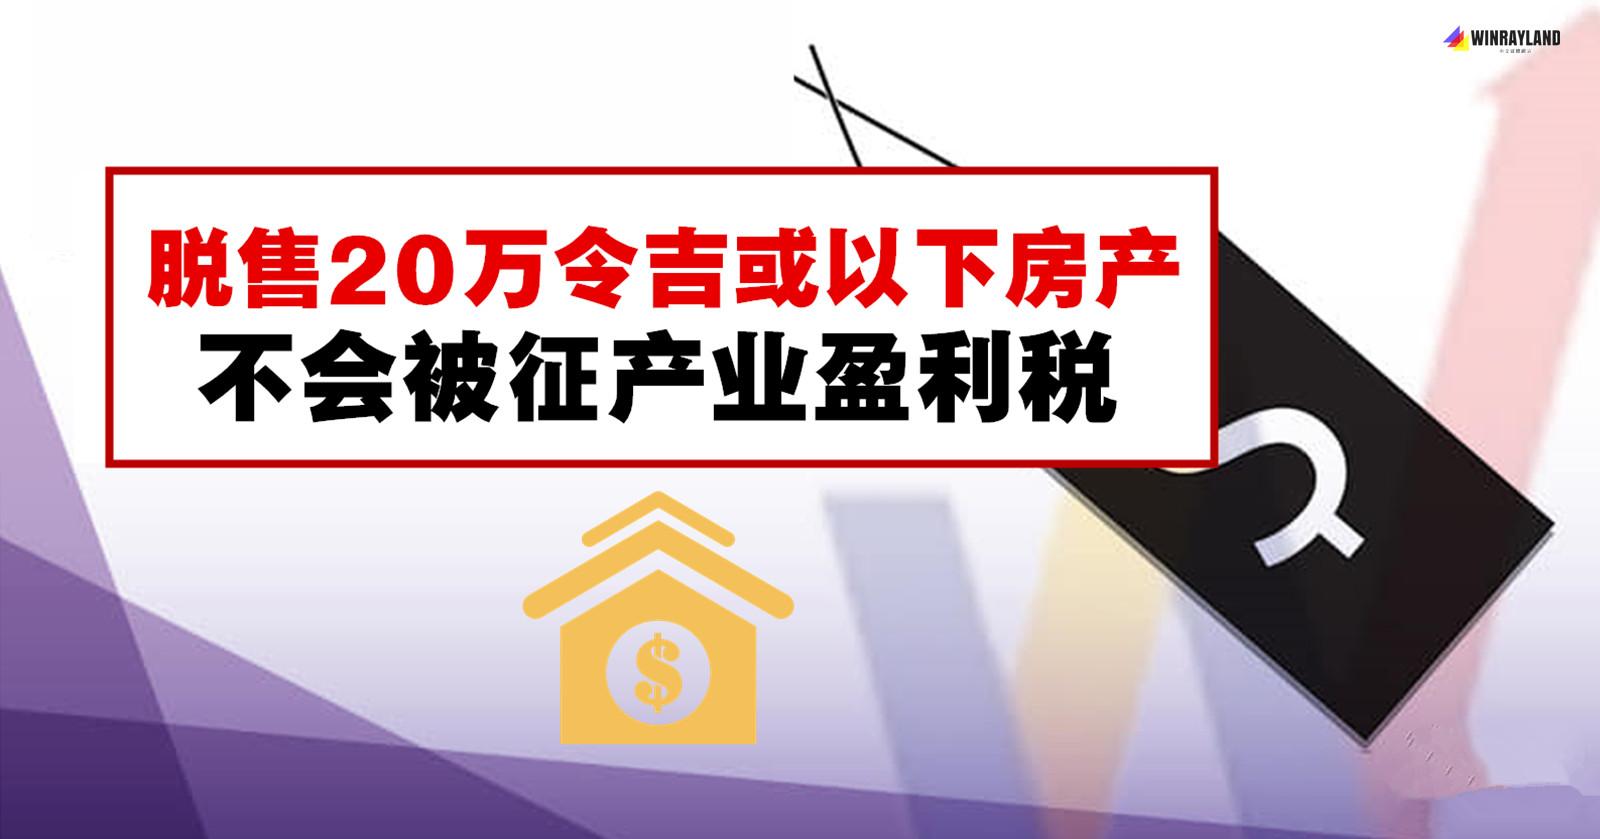 Image result for 产业盈利税